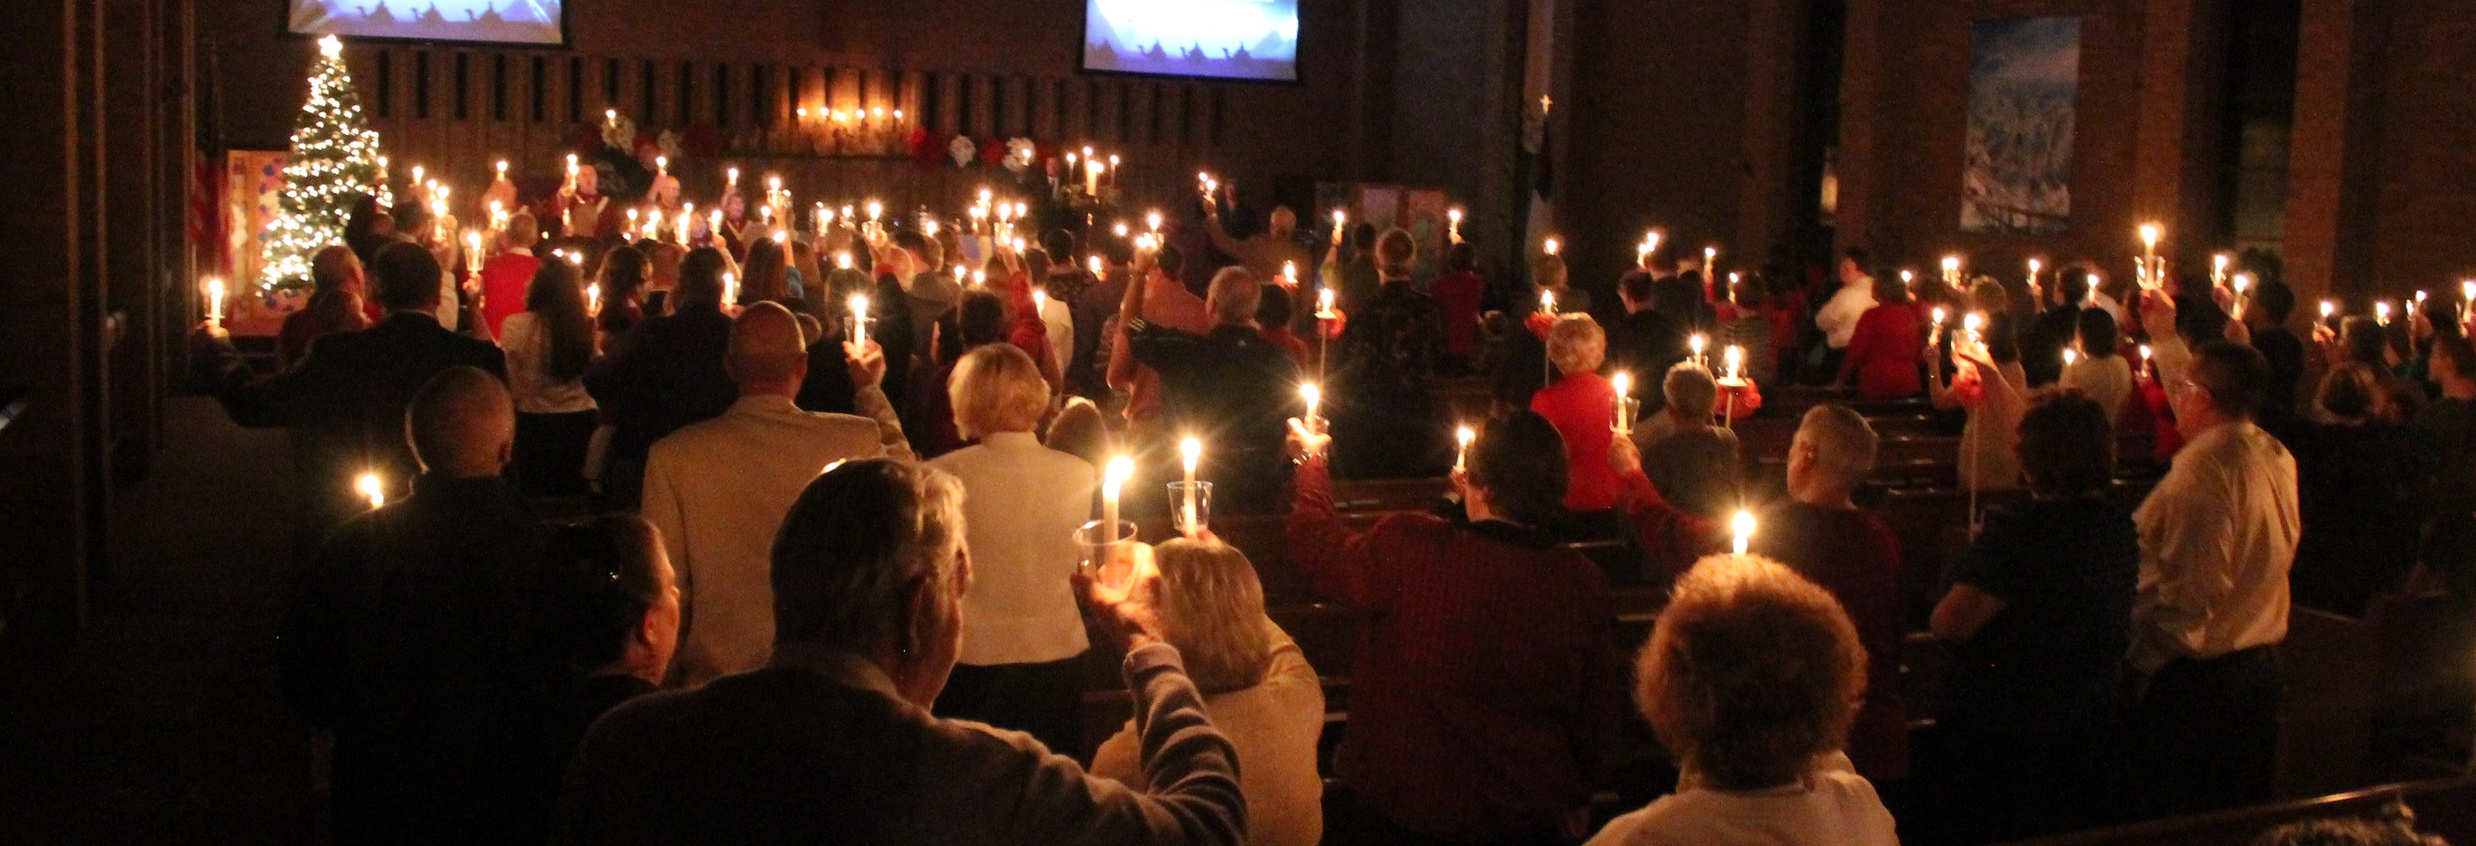 Christmas Eve Candle Light Service - Dec 24 - 7:00pm